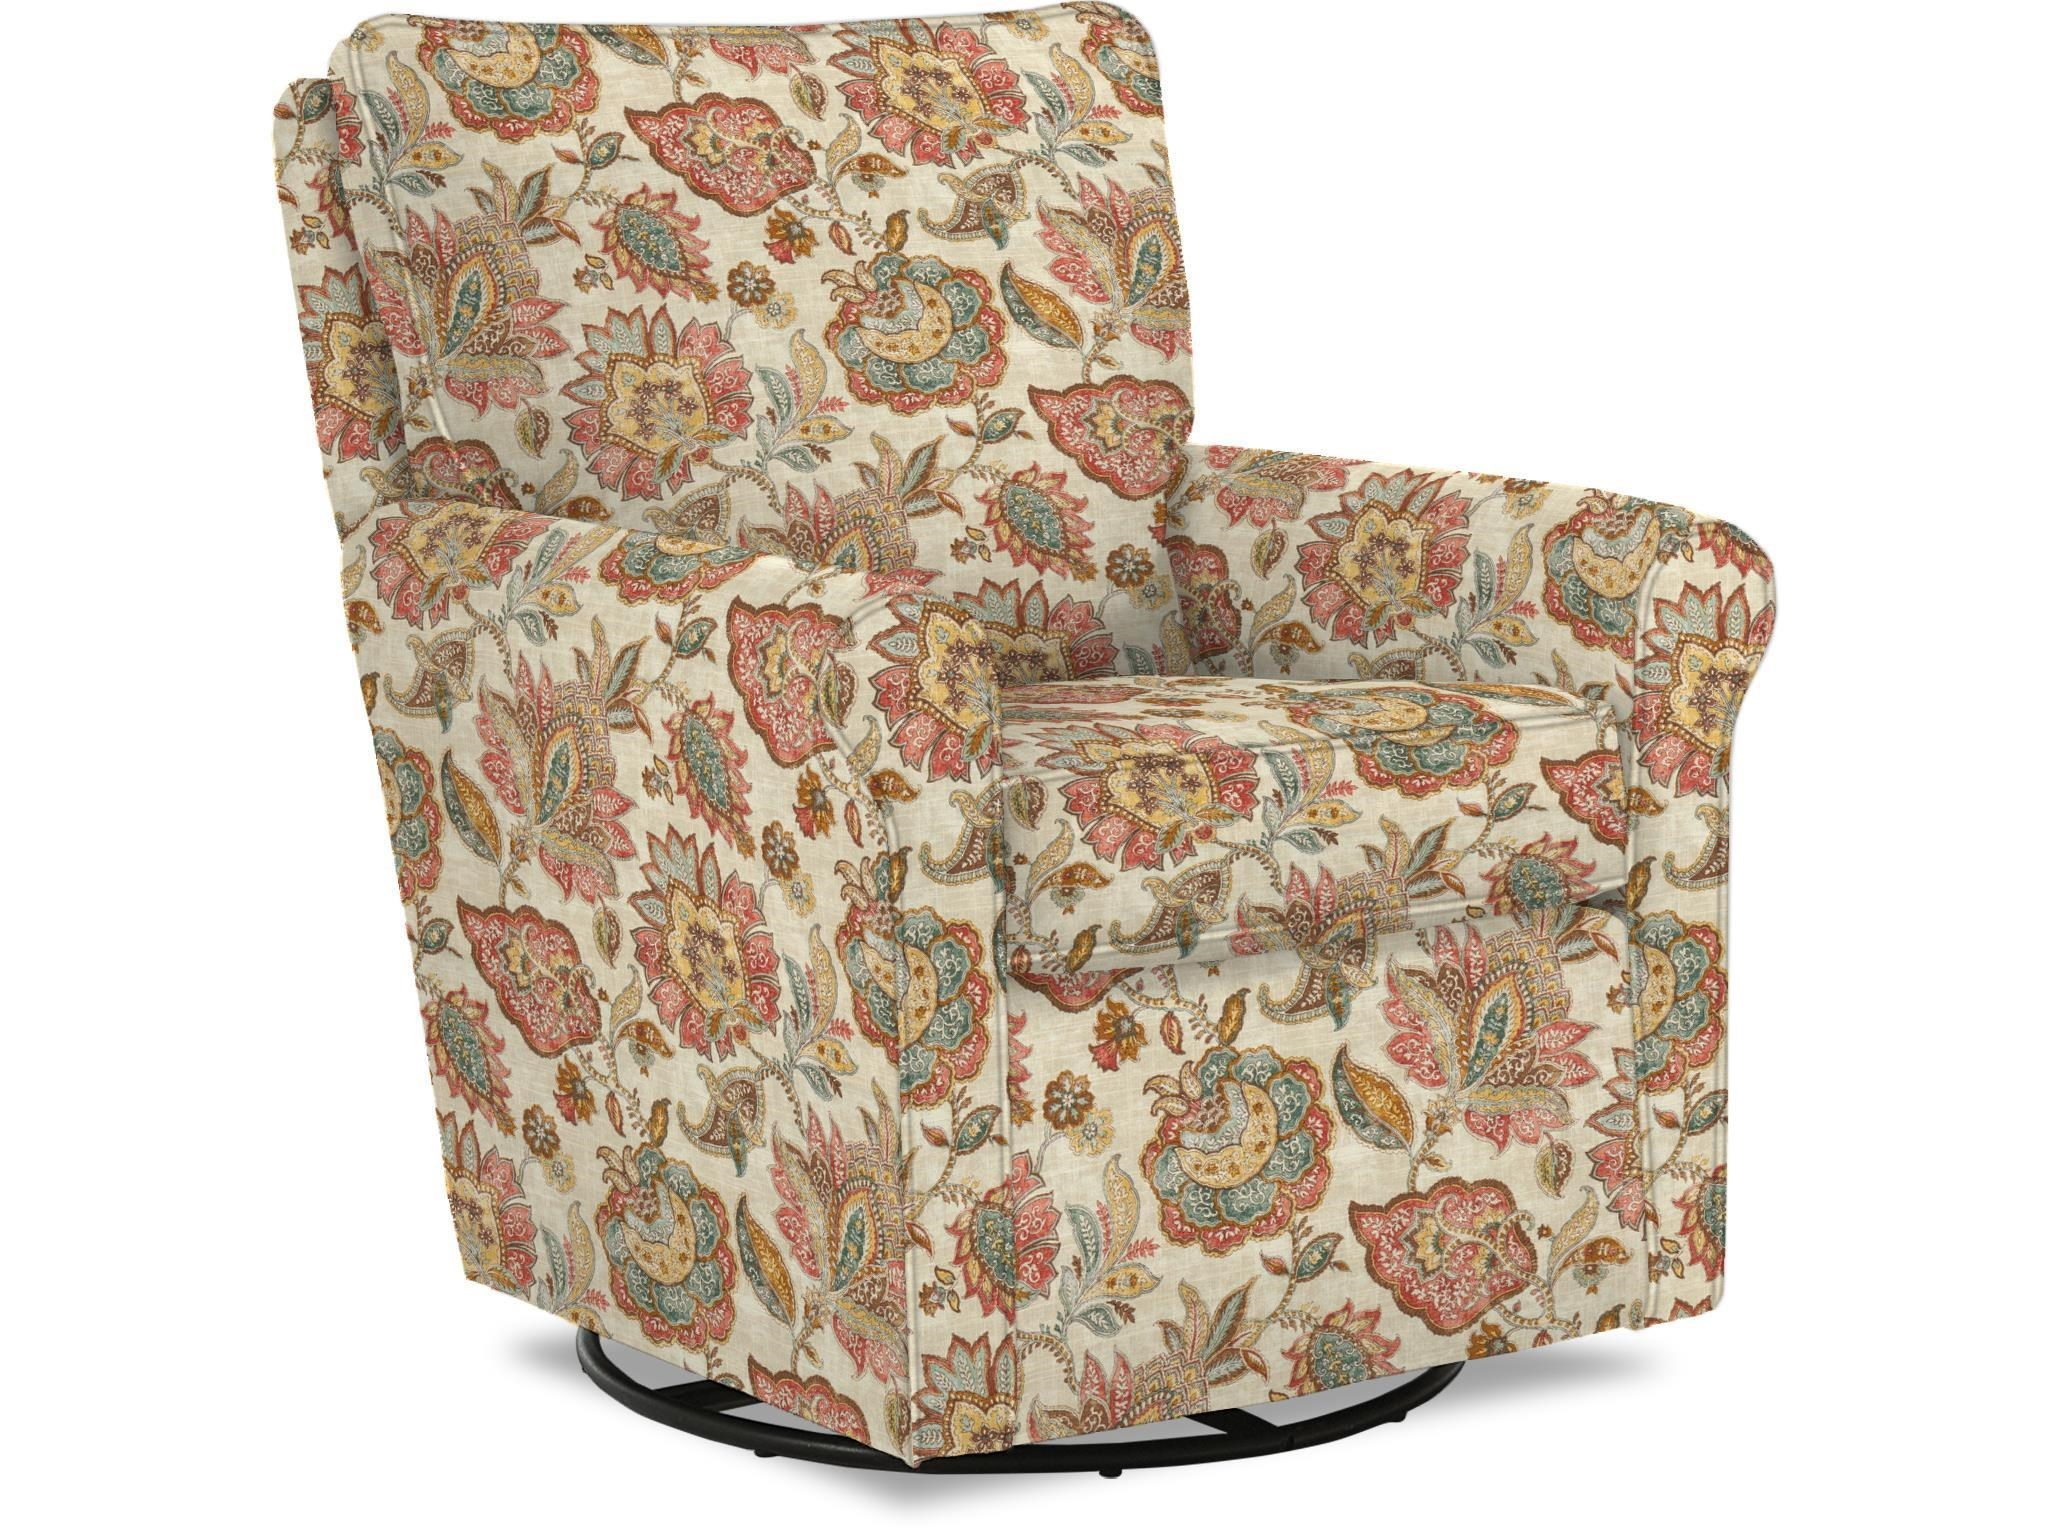 Best Home Furnishings Kacey Casual Swivel Glider Chair